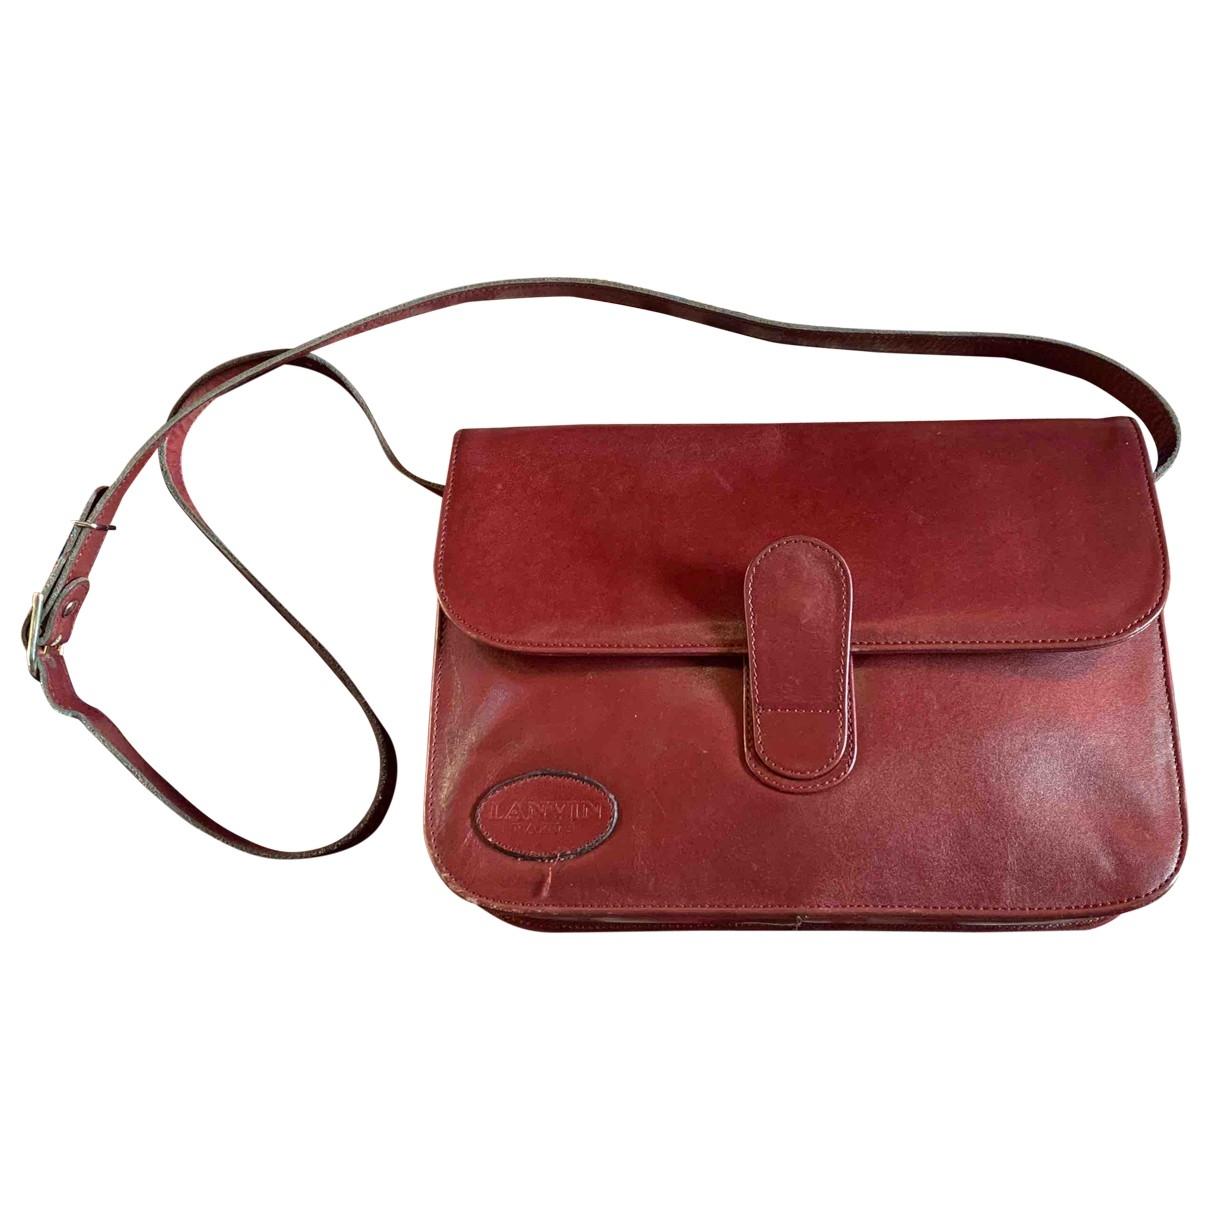 Lanvin \N Burgundy Leather handbag for Women \N